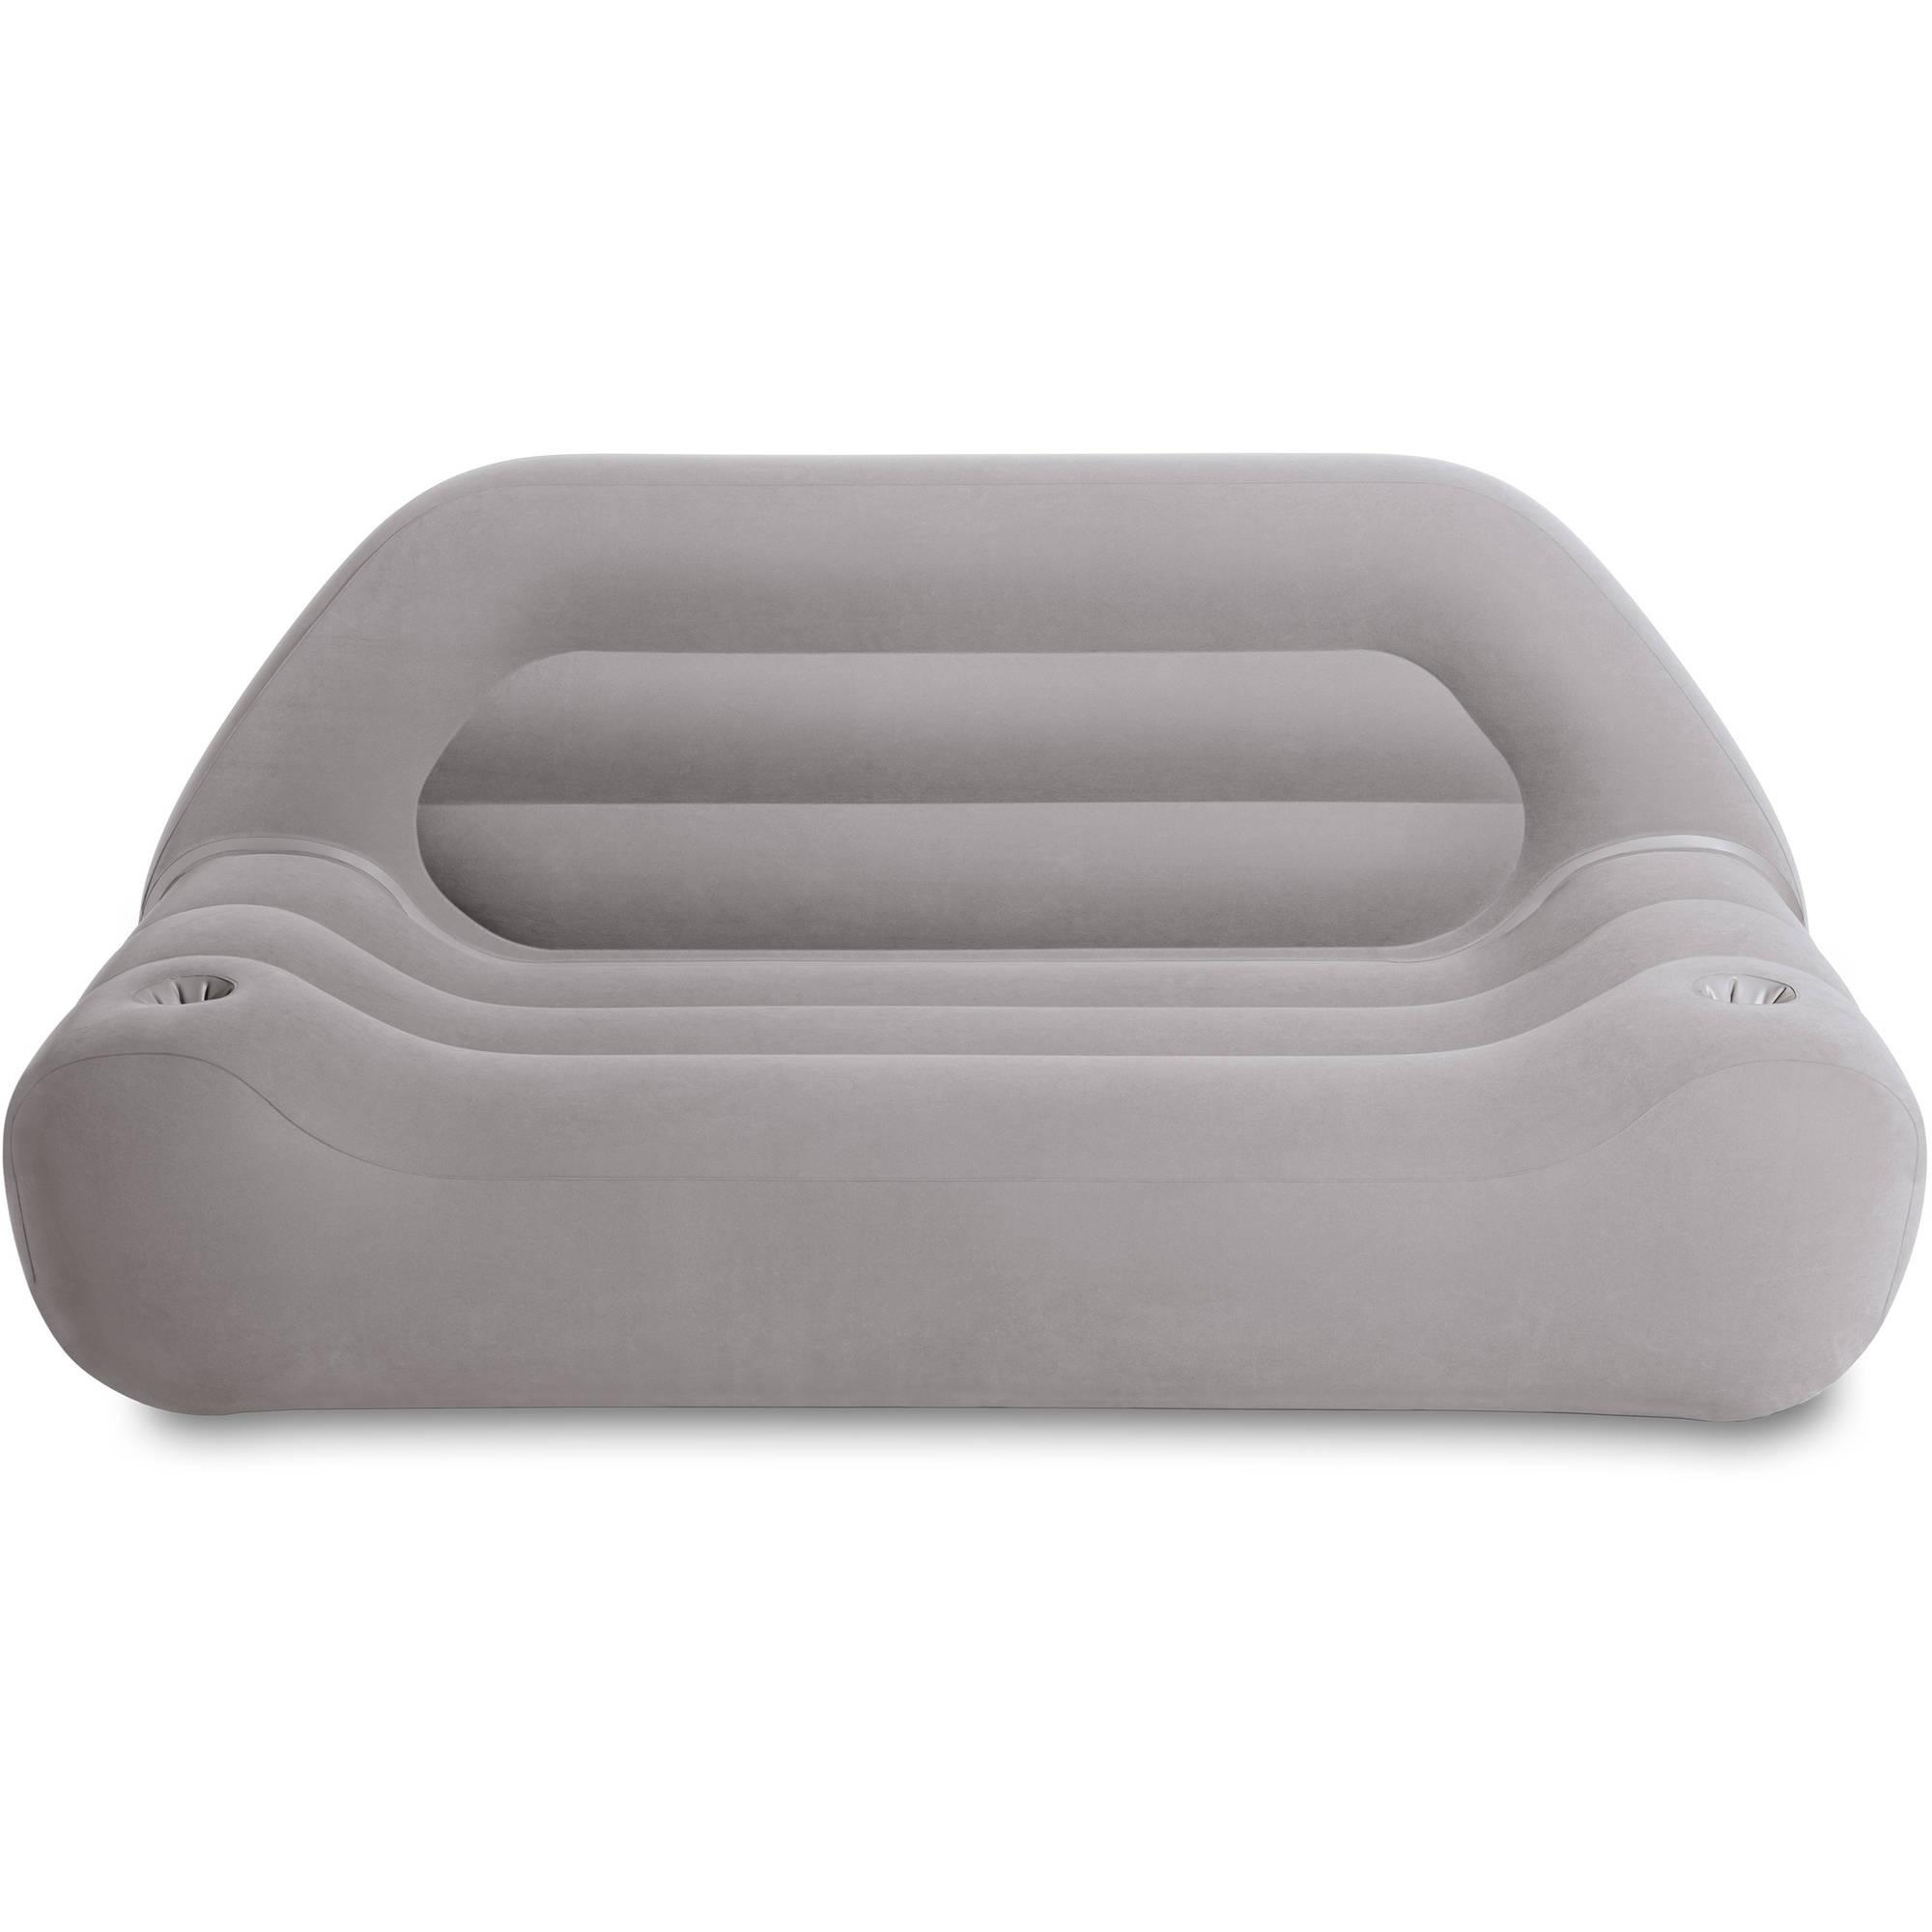 Intex Inflatable Camping Sofa – Walmart Regarding Intex Inflatable Sofas (Image 5 of 20)